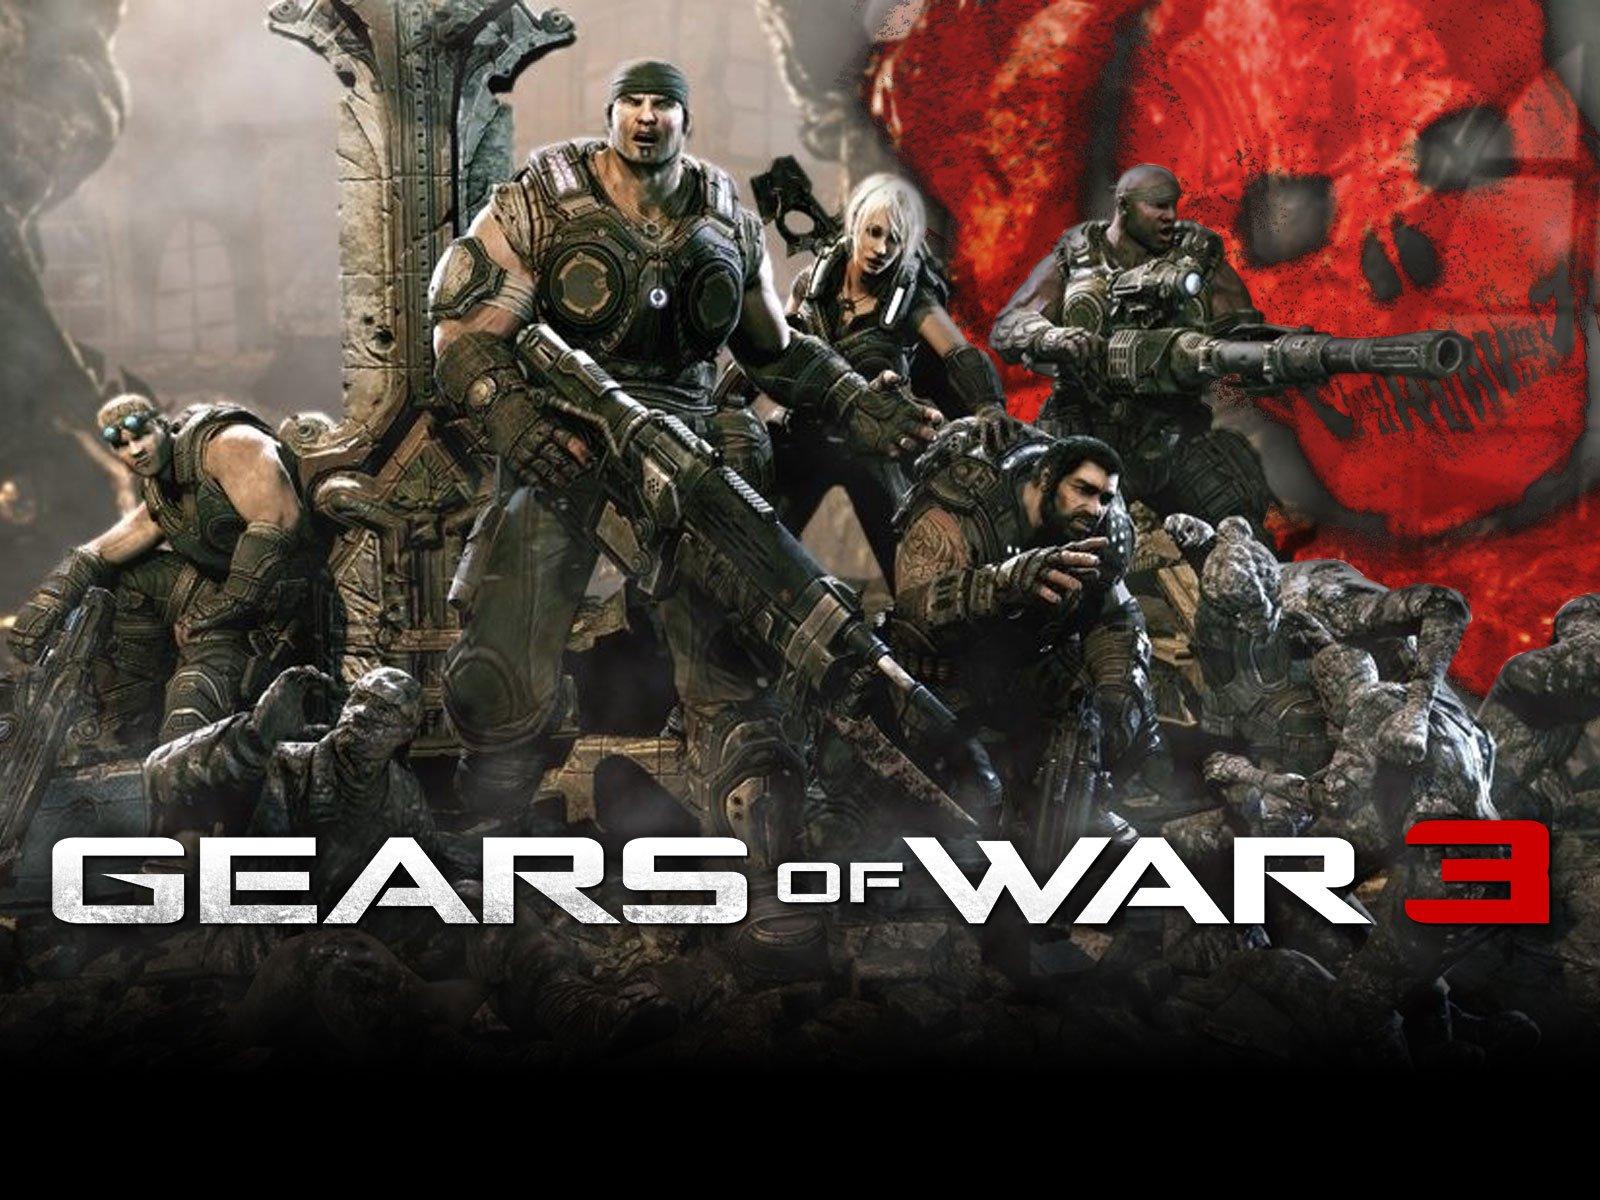 Gears of War 3 Wallpapers Risen Sources 1600x1200